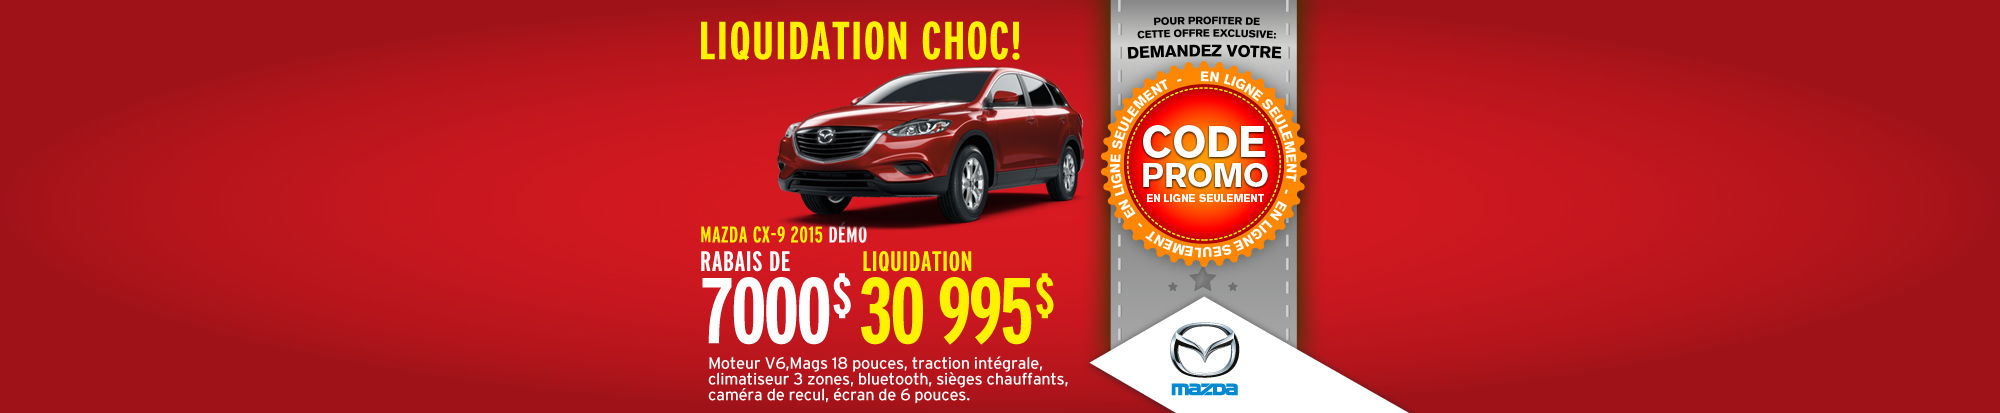 Véhicules de l'année Mazda CX-9